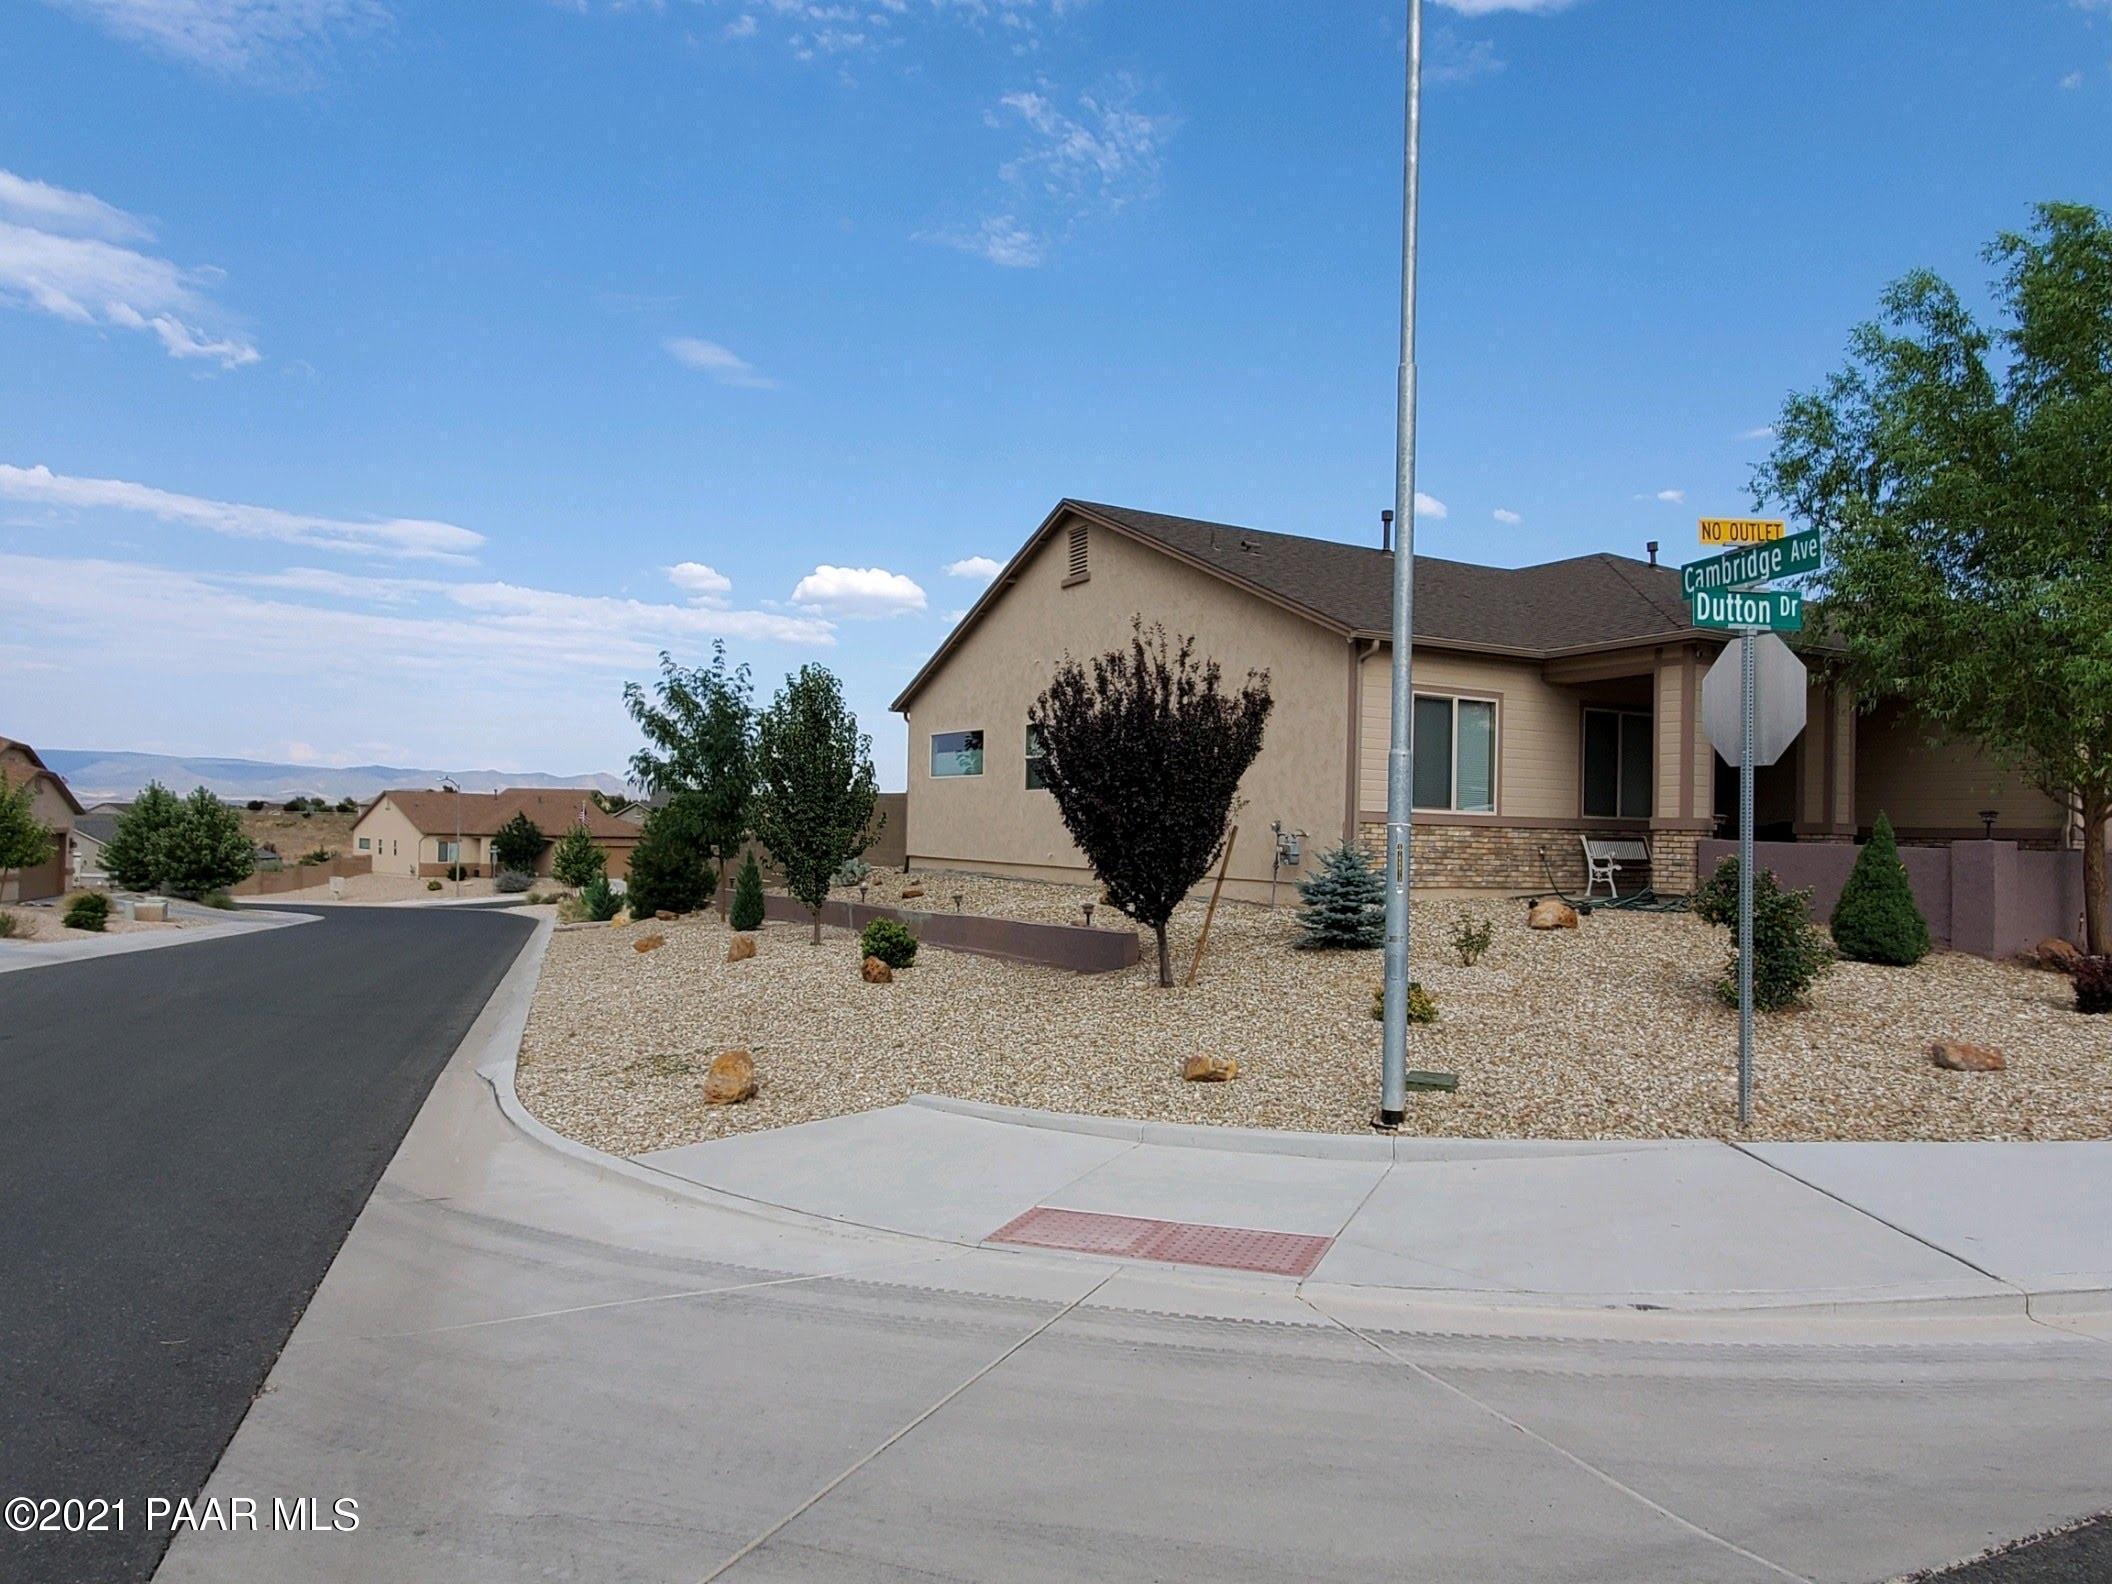 Photo of 6192 Dutton, Prescott Valley, AZ 86314